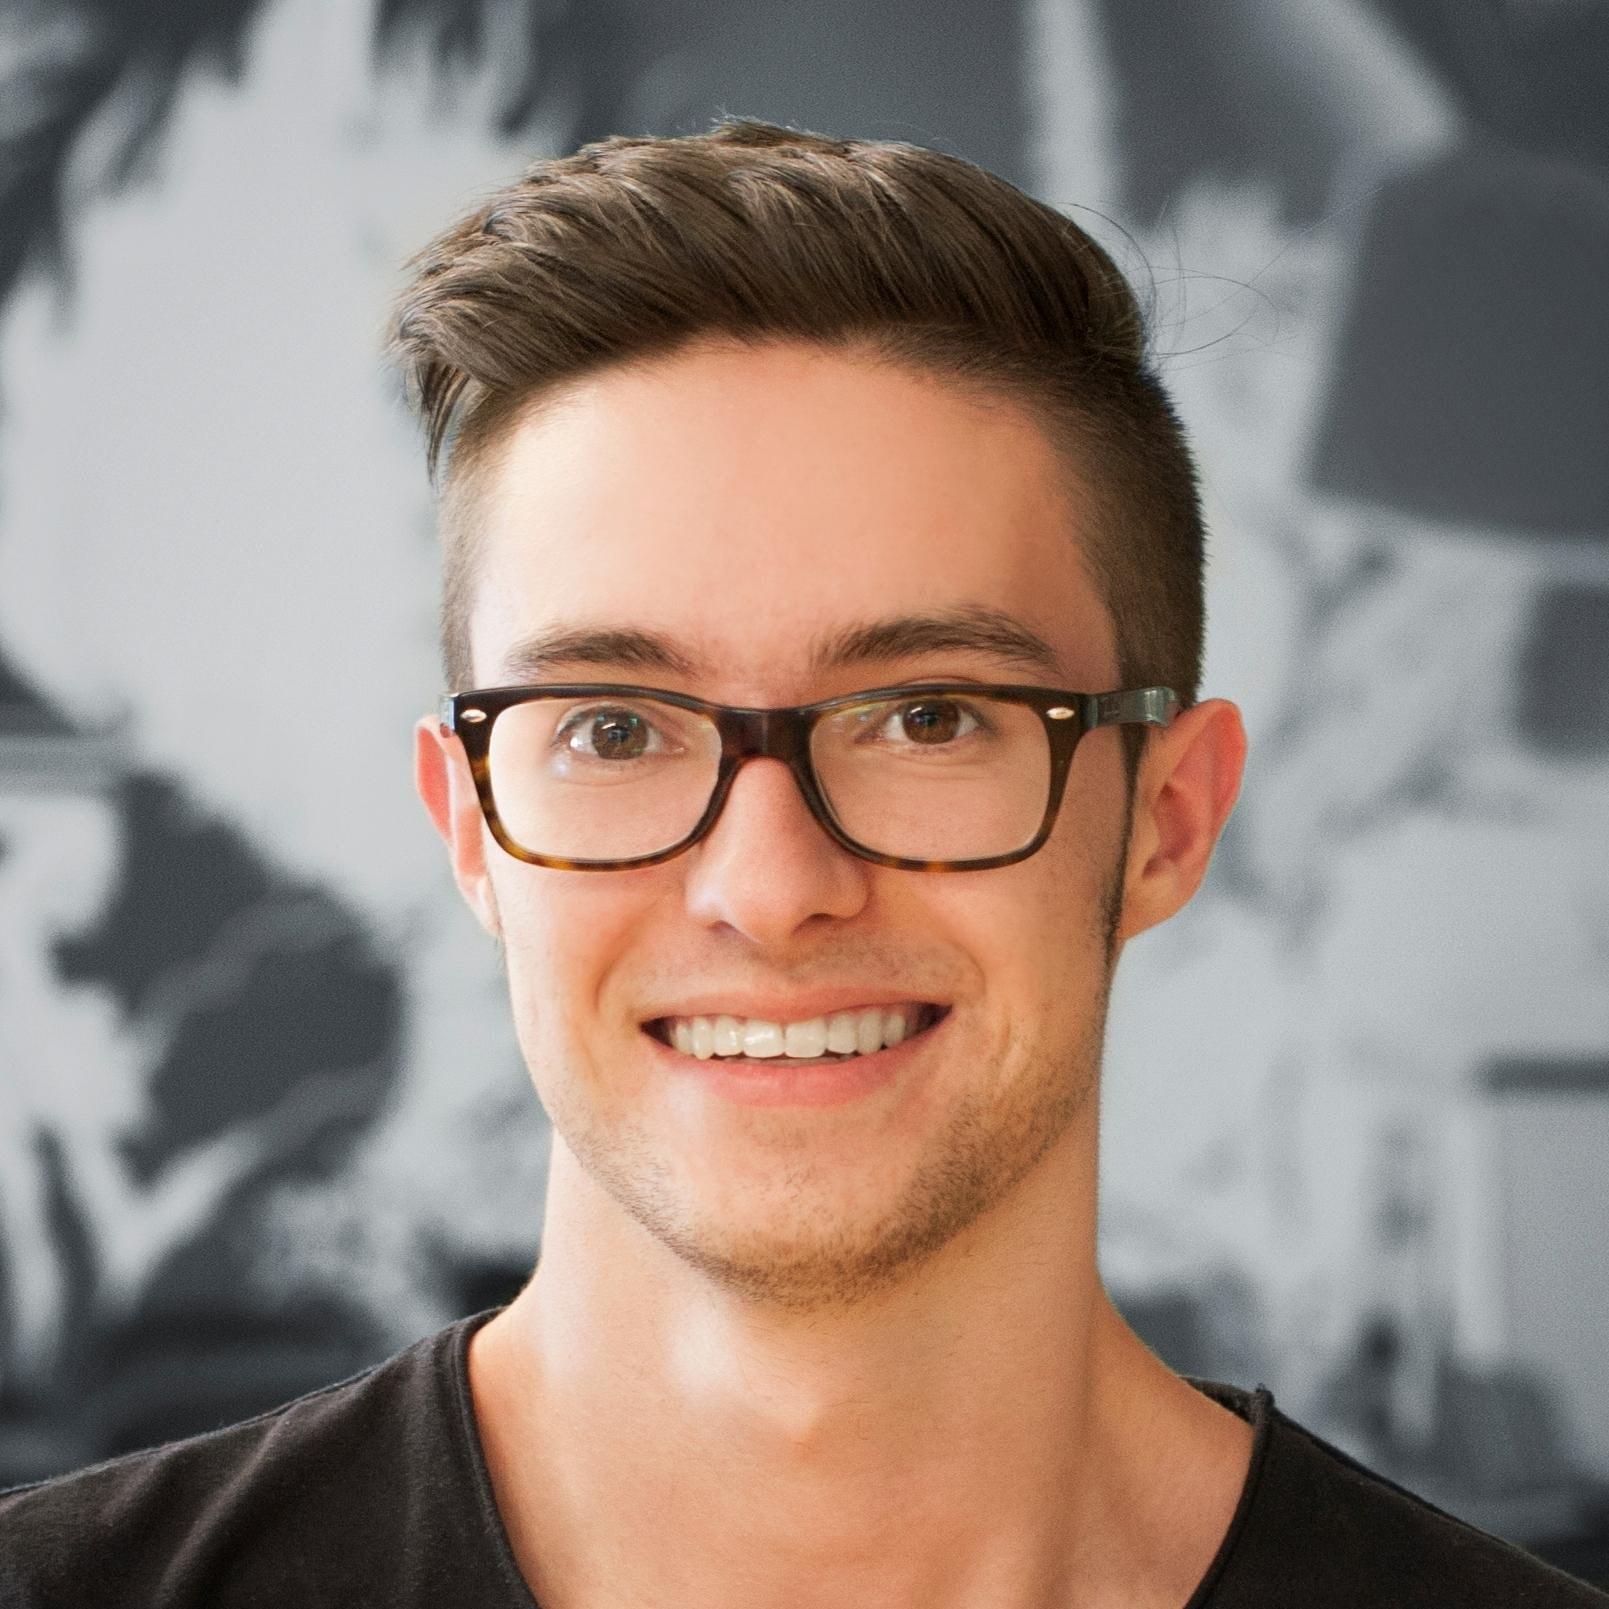 Avatar of user Kevin Clark